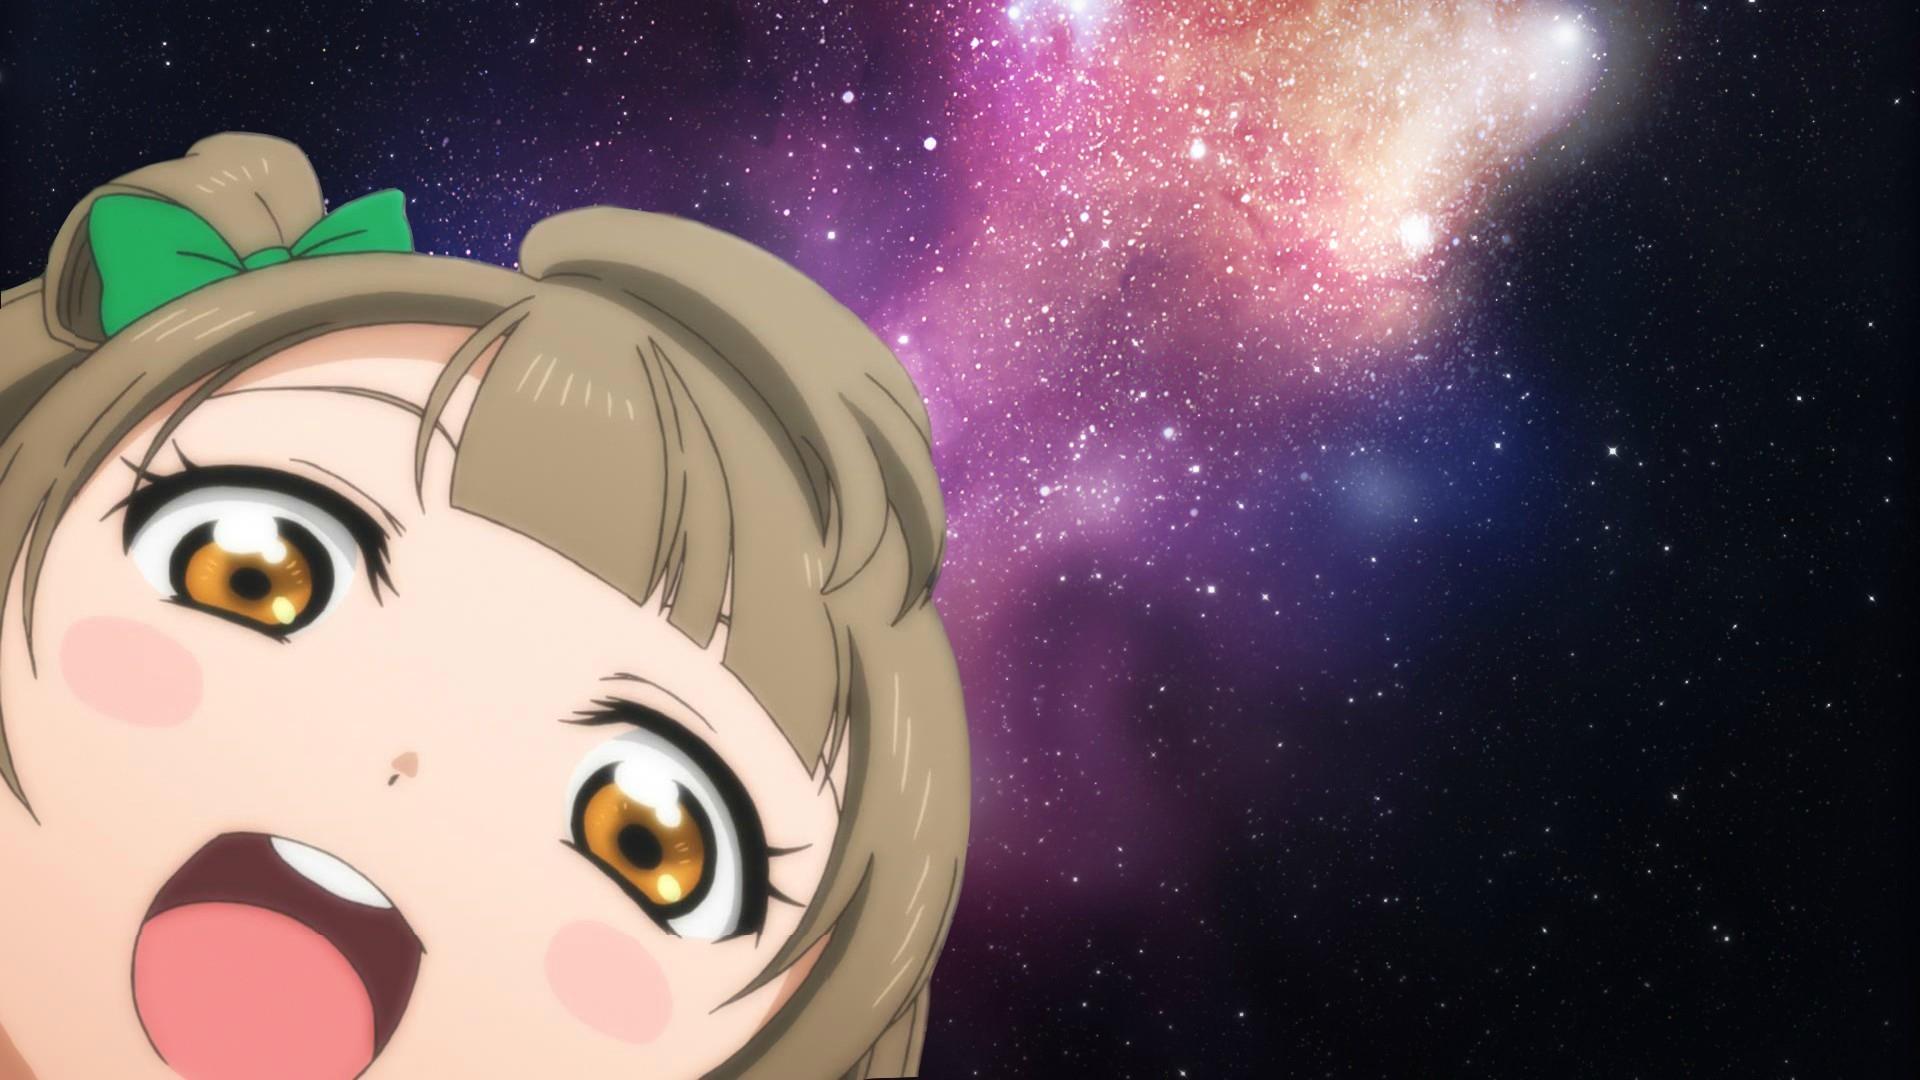 Res: 1920x1080, Love Live! School Idol Festival Umi Sonoda anime human hair color sky  cartoon snapshot computer